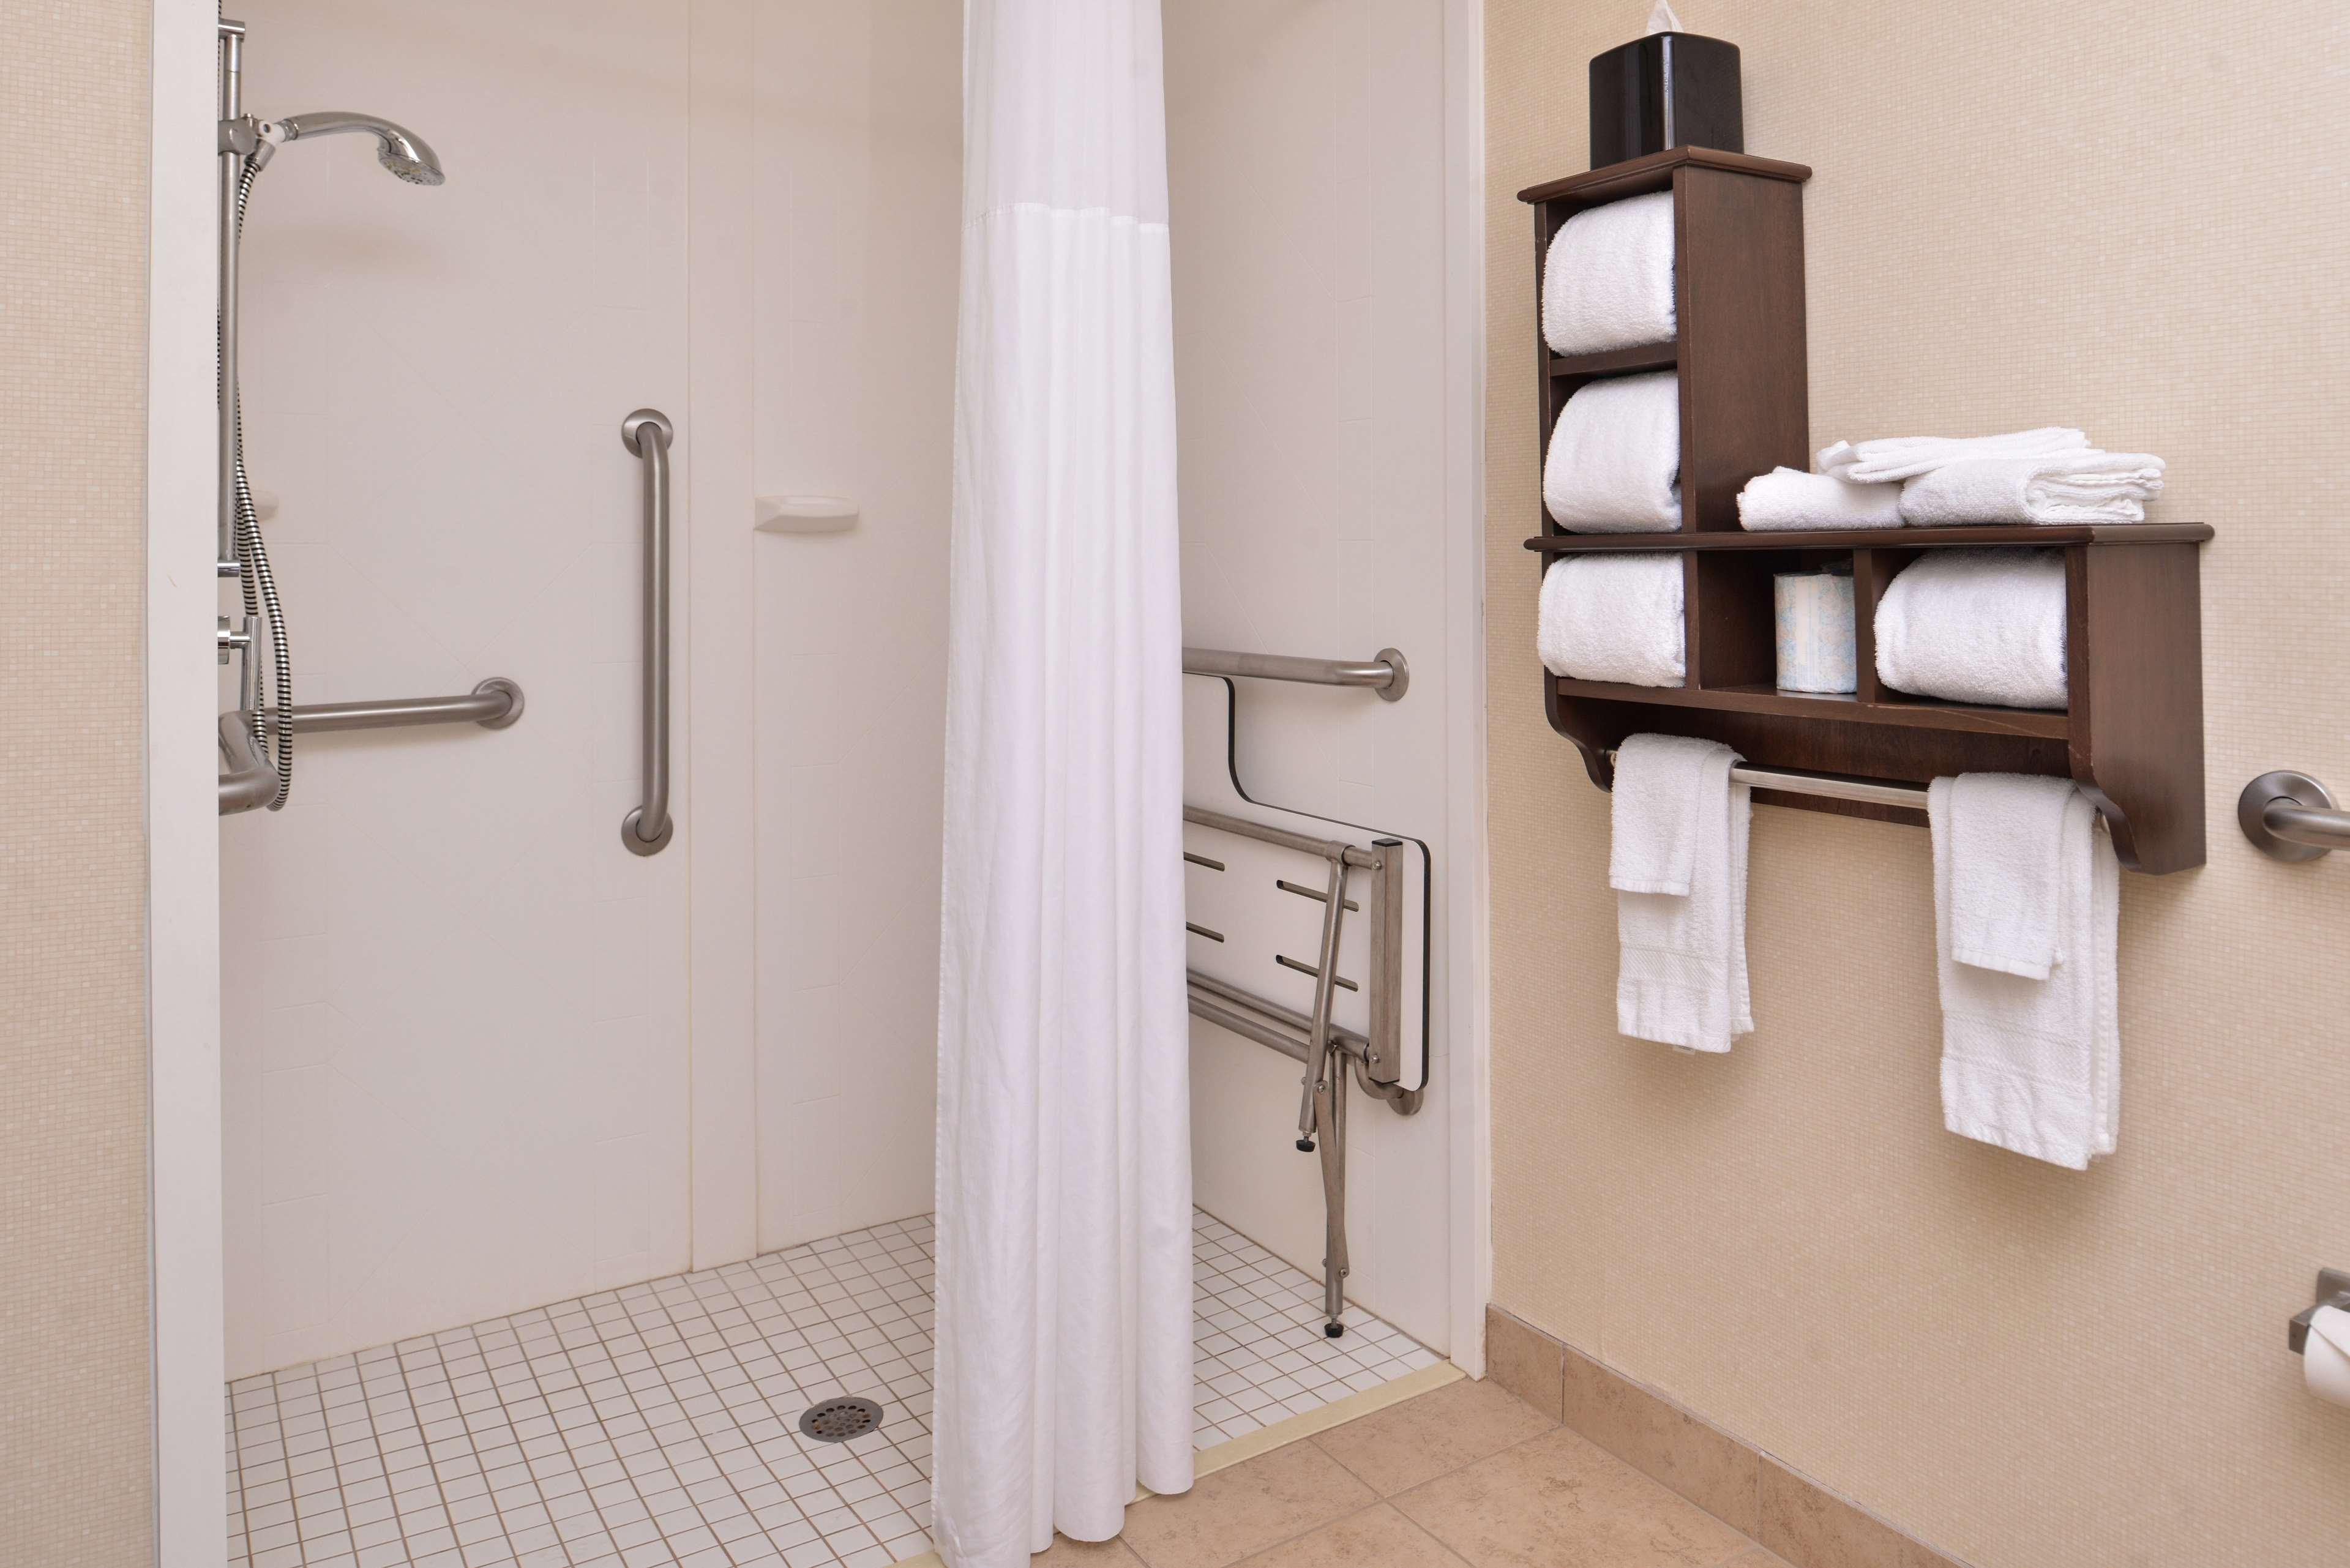 Hampton Inn & Suites Newport News (Oyster Point) image 32